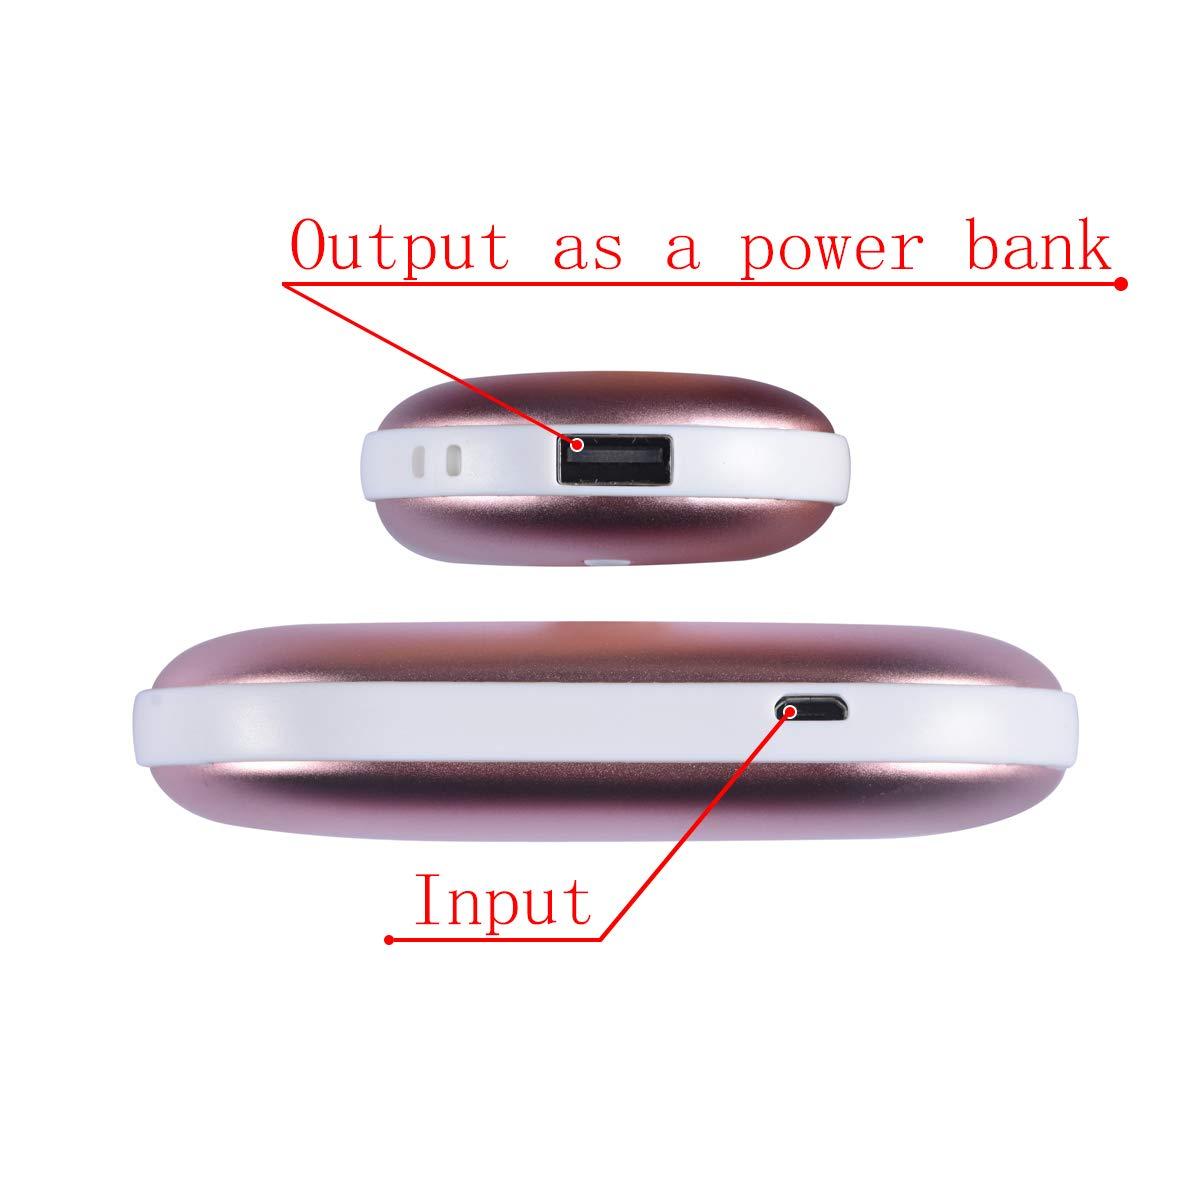 Artiky Hand Warmers Rechargeable 5200mAh Electric Hand Warmer//Power Bank Reusable Portable USB Heater Battery Hot Pocket Warmer Heat Handwarmers Rechargeable Hand Warmers